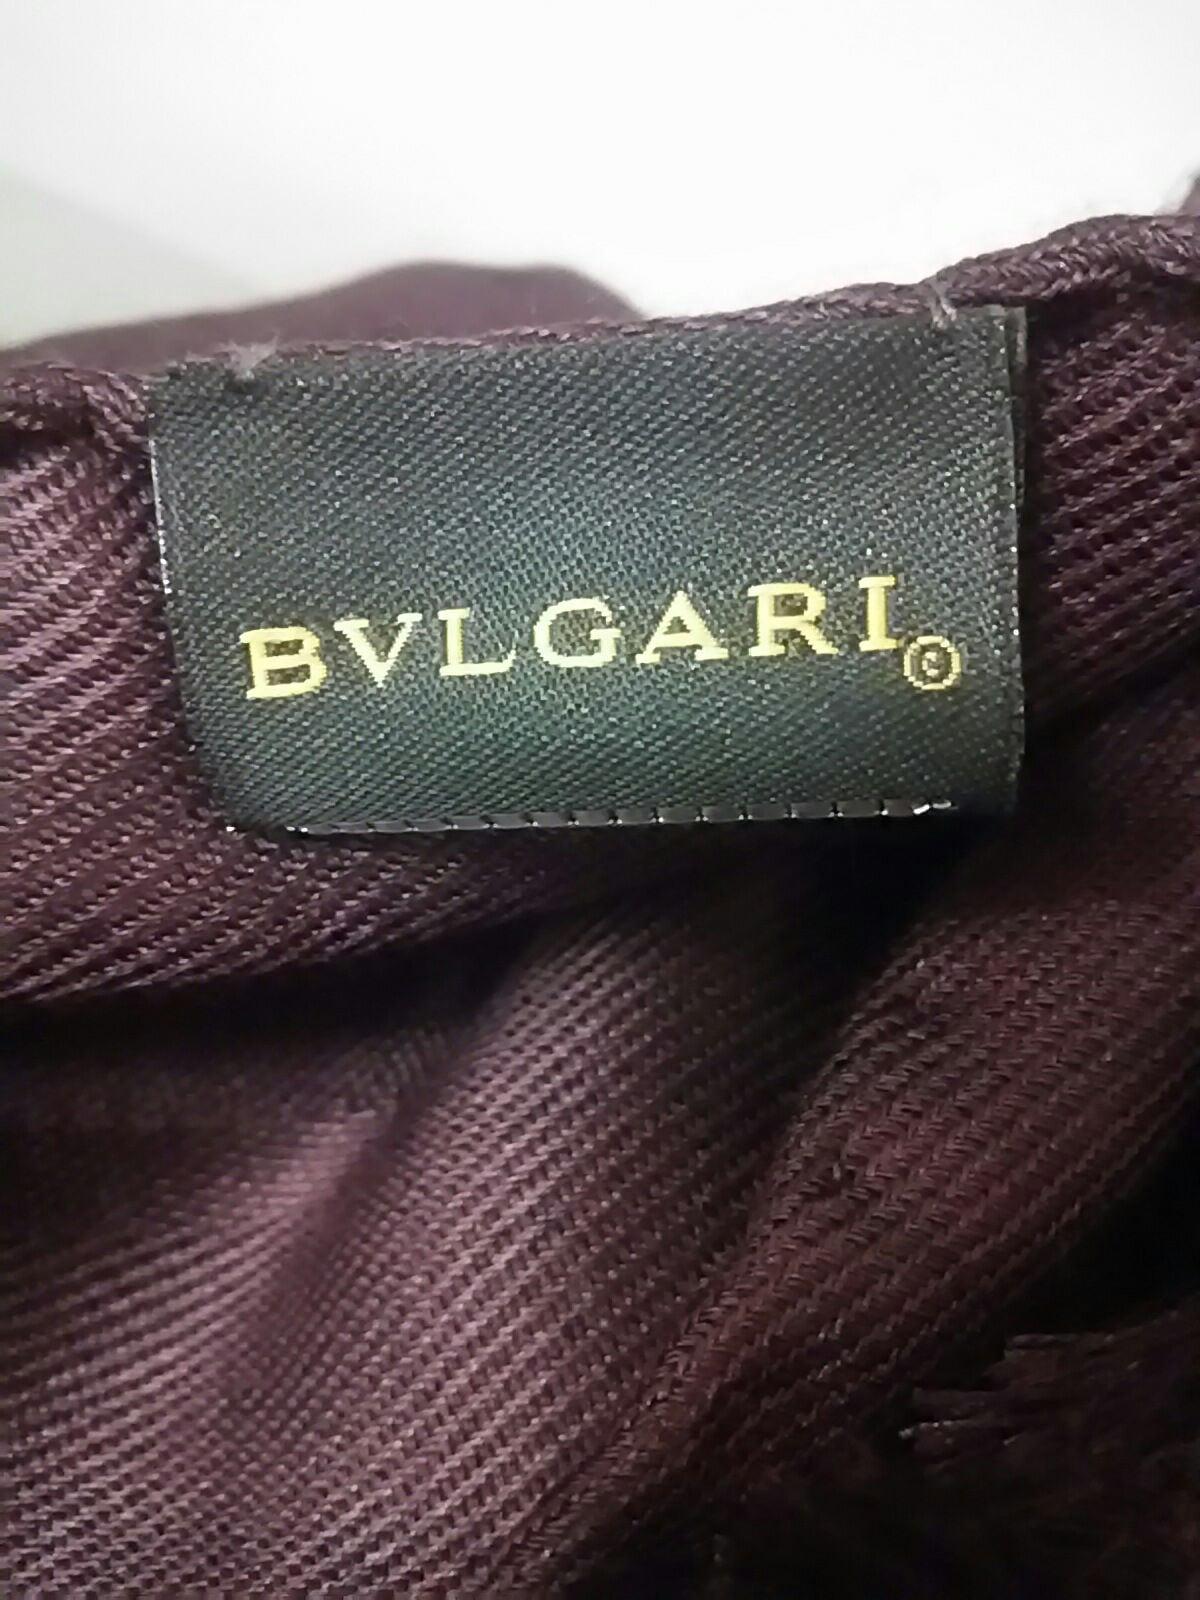 BVLGARI(ブルガリ)のロゴマニア